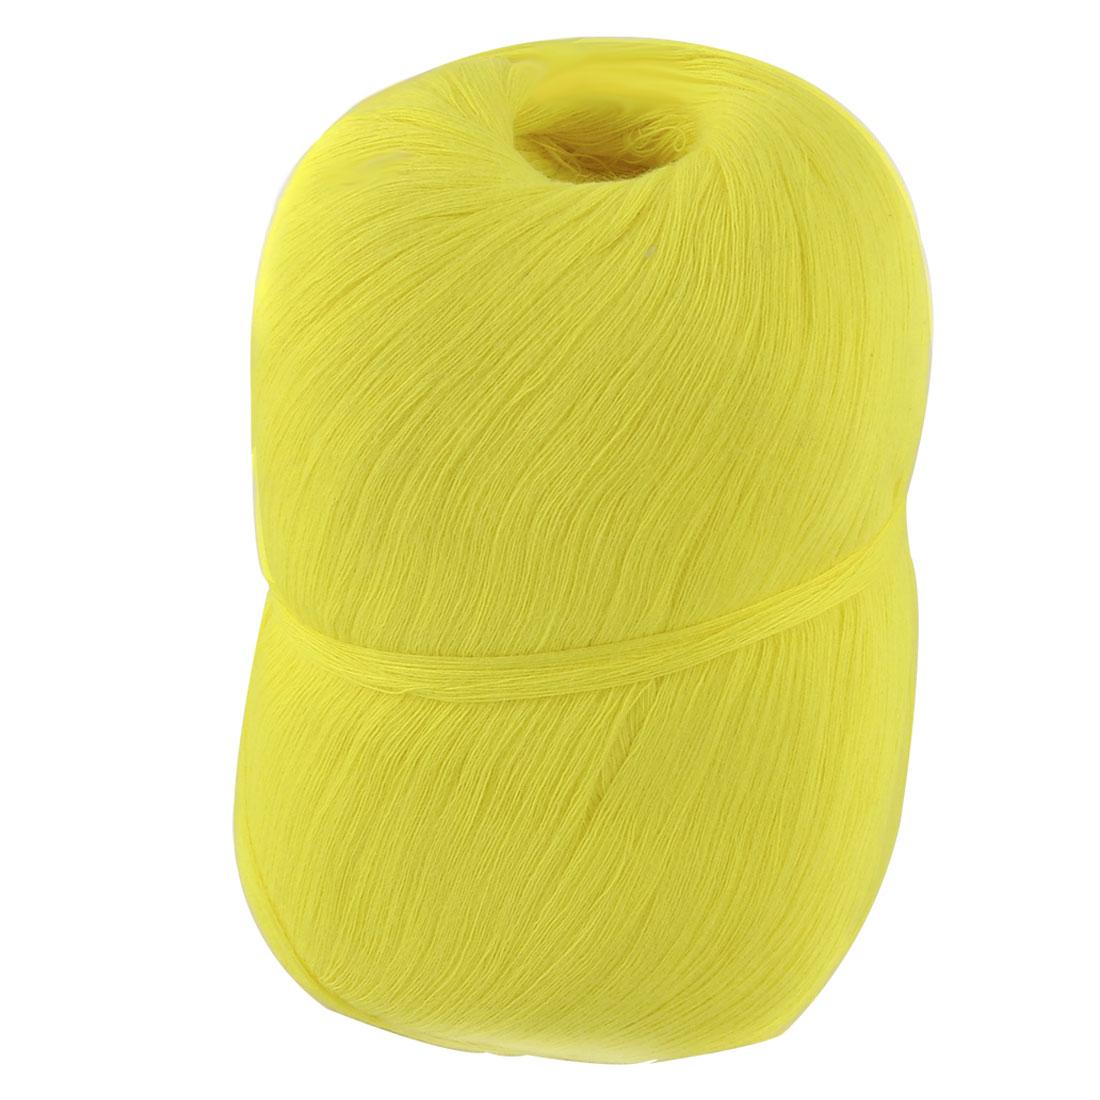 Hand DIY Clothes Tatting Knitting Cotton Thread Embroidery Craft Yarn Yellow